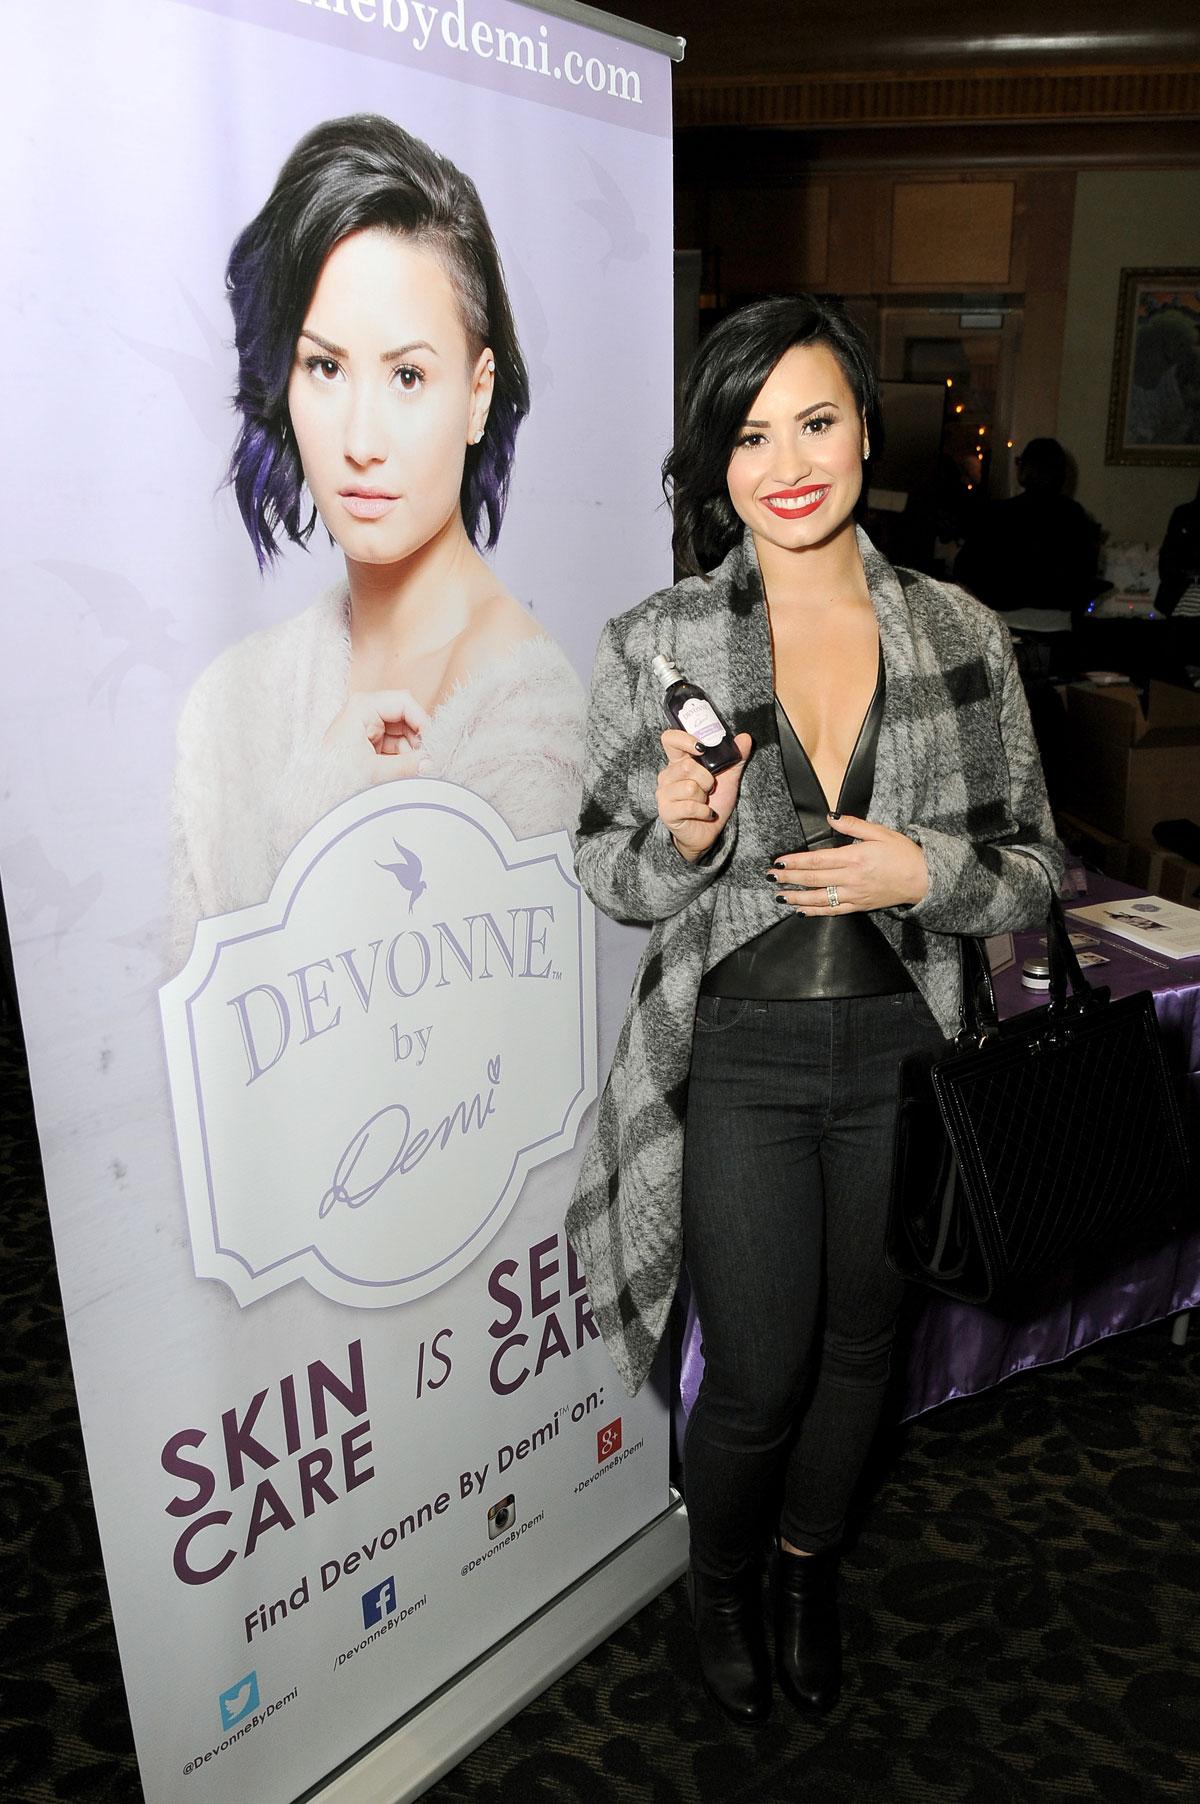 Demi Lovato attends KIIS FM Jingle Ball 2014 Gifting Lounge